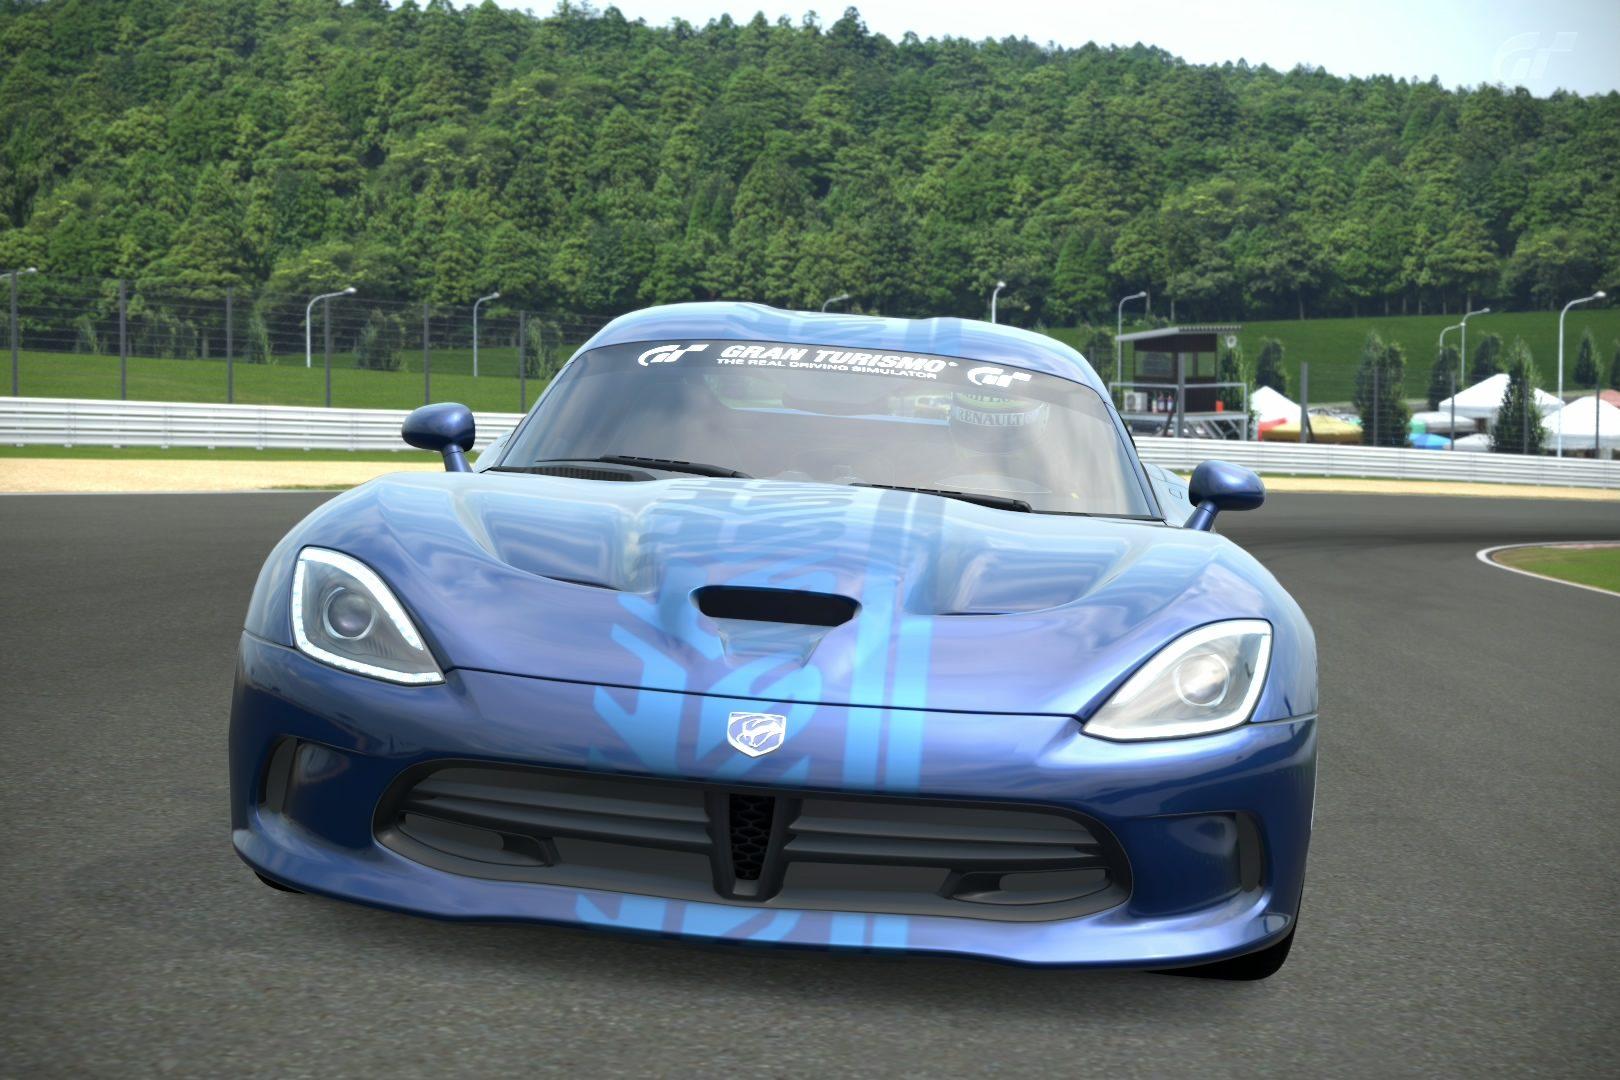 CorvetteStingrayAEImg2.jpg